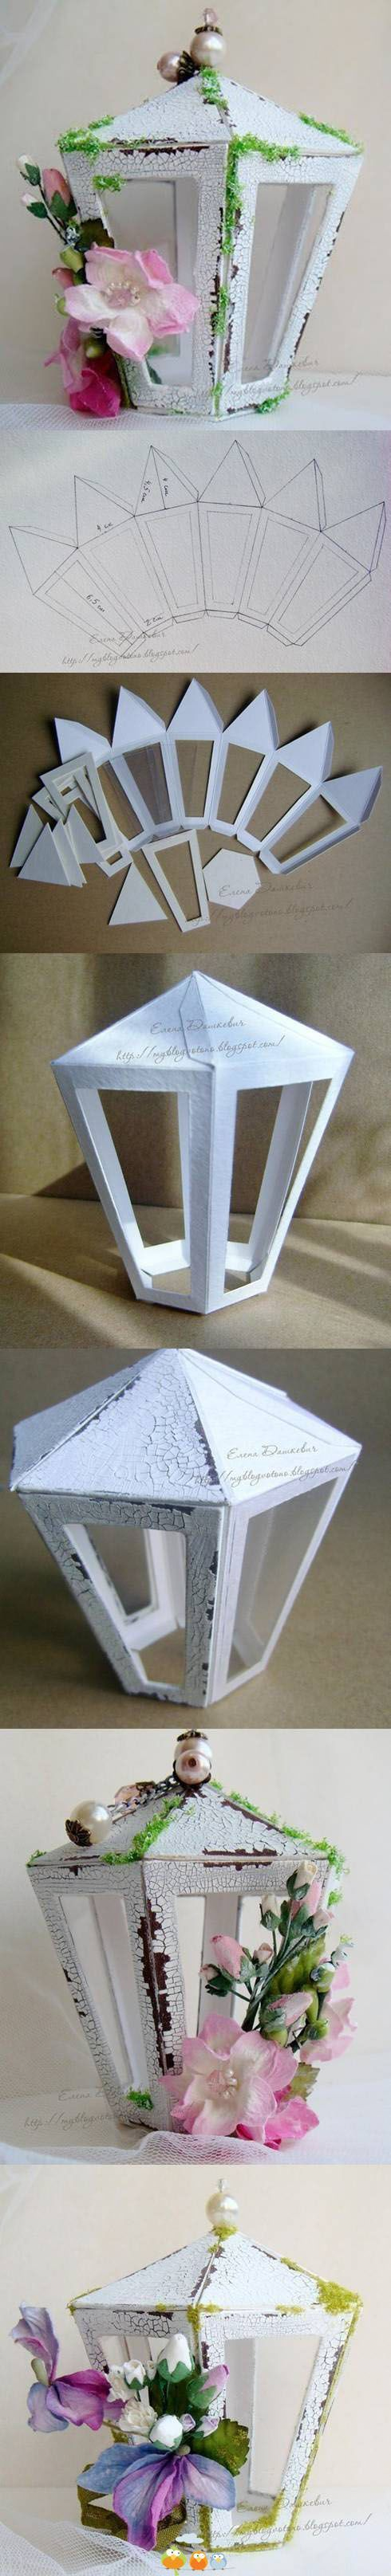 Paper Lantern, http://media-cache-ak0.pinimg.com/originals/a4/9f/5f/a49f5f48760f0d36493a36066f8230a7.jpg: